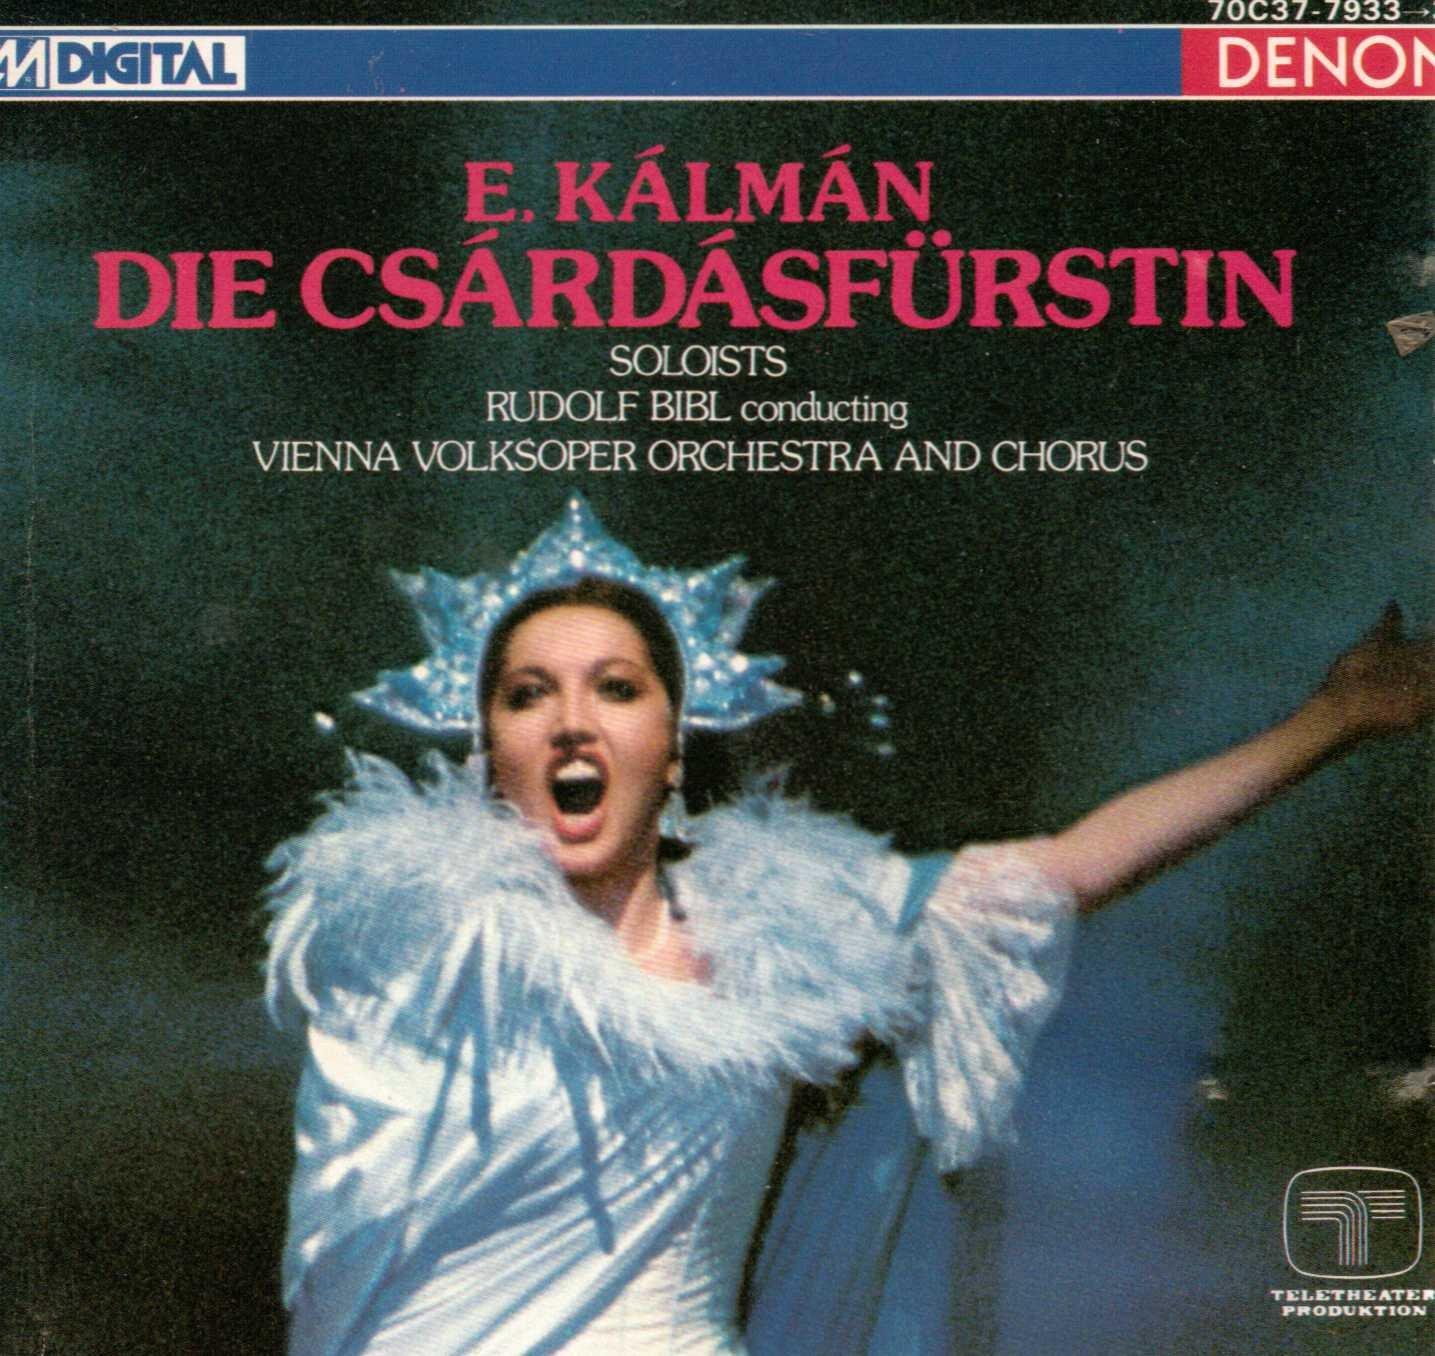 Kalman - Rudolf Bibl, Vienna Volksoper And Chorus Die Csardasfurstin